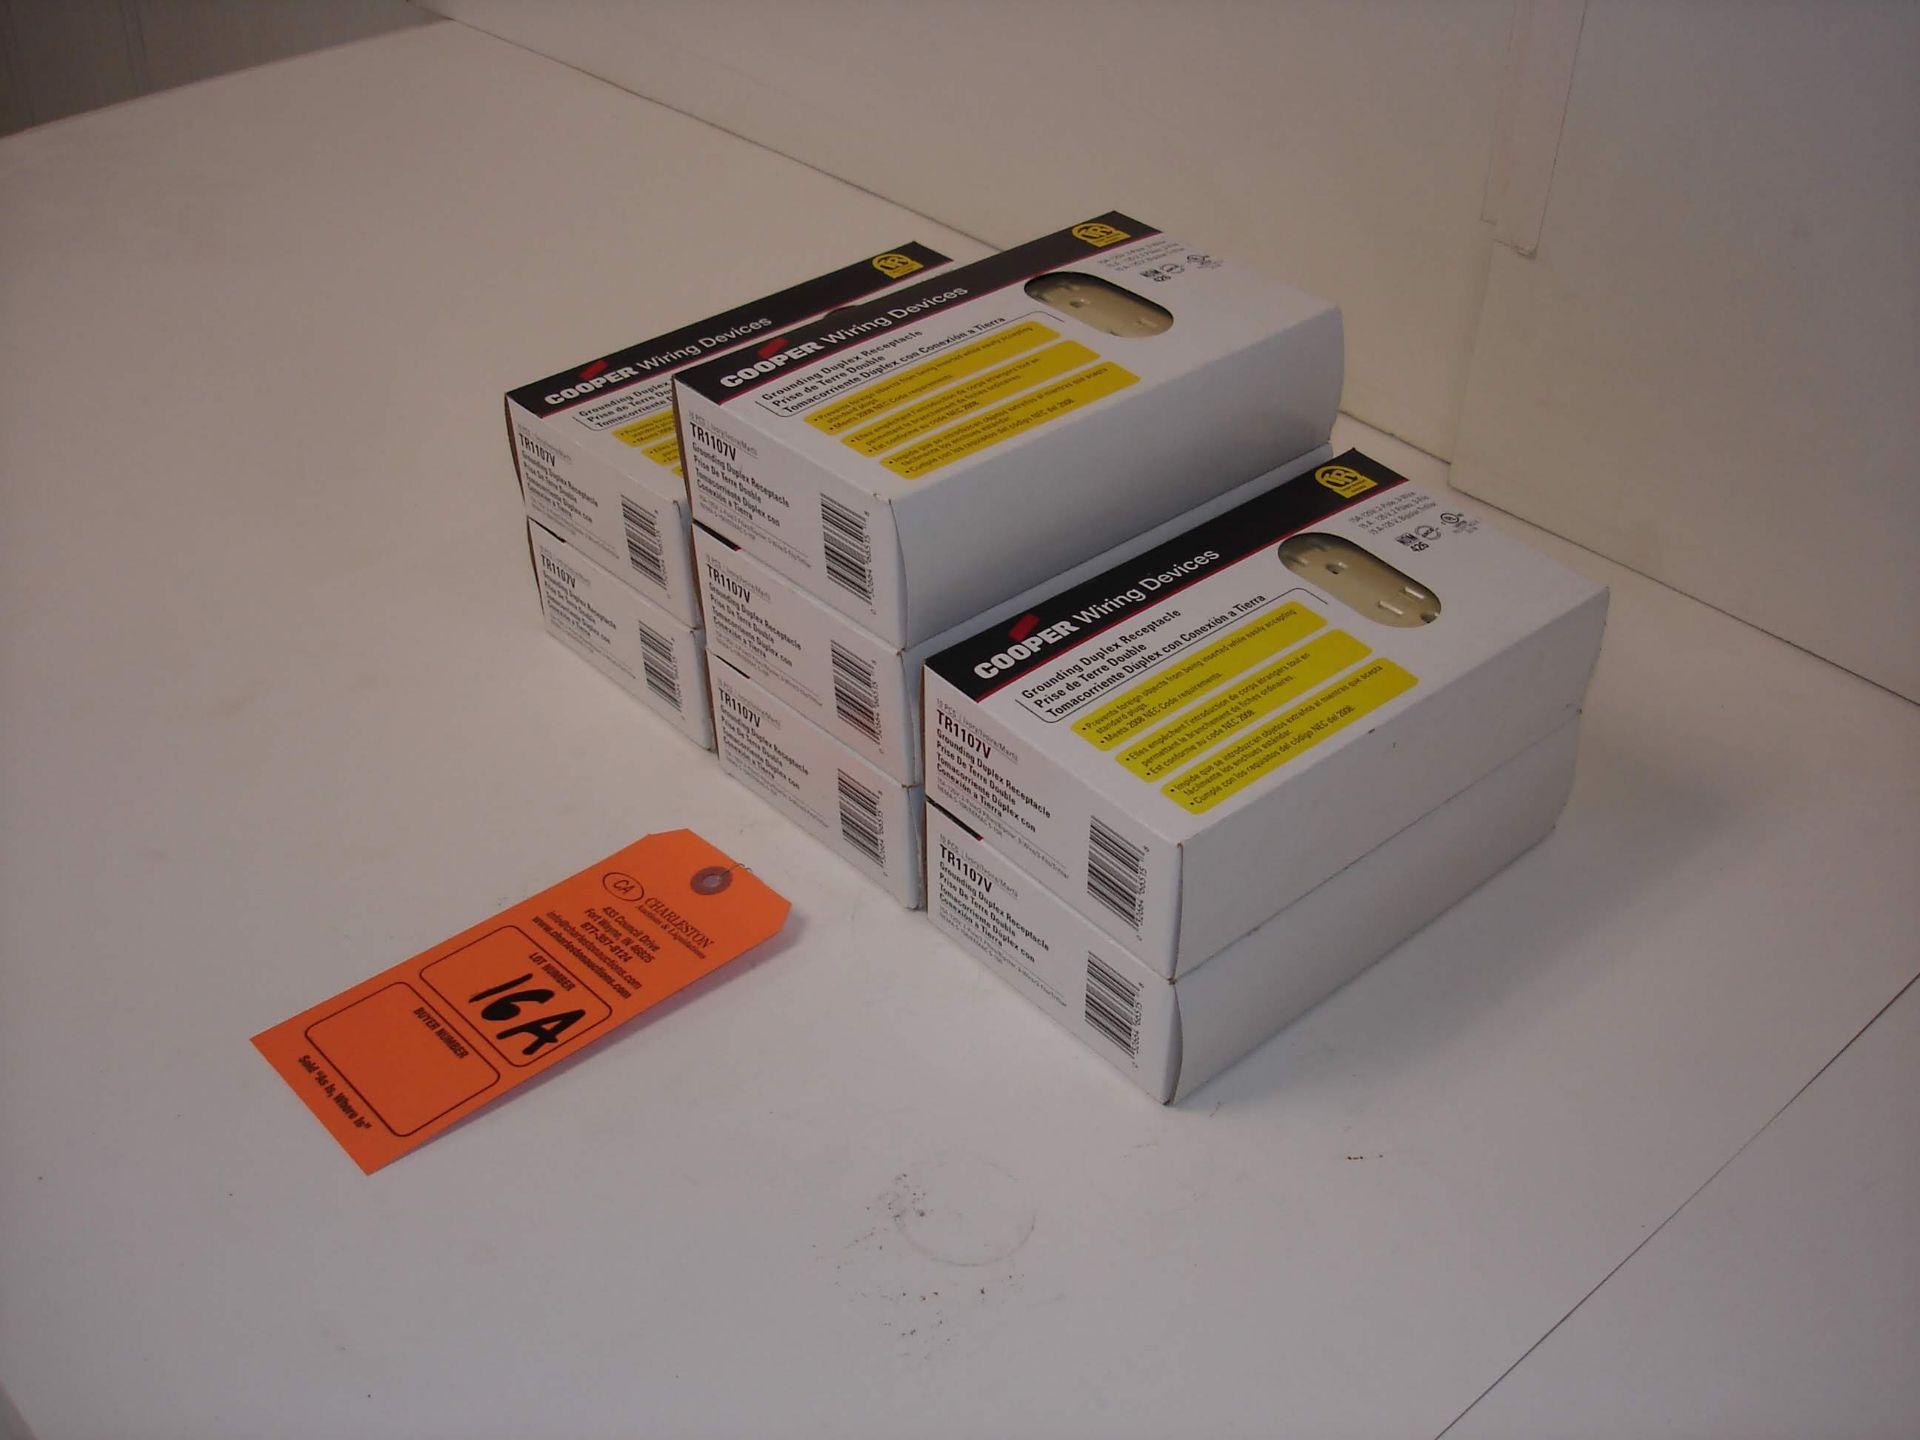 Lot 16A - (7) COOPER TR1107V IVORY RECEPTACLES 10/BOX REFER TO PHOTOS!